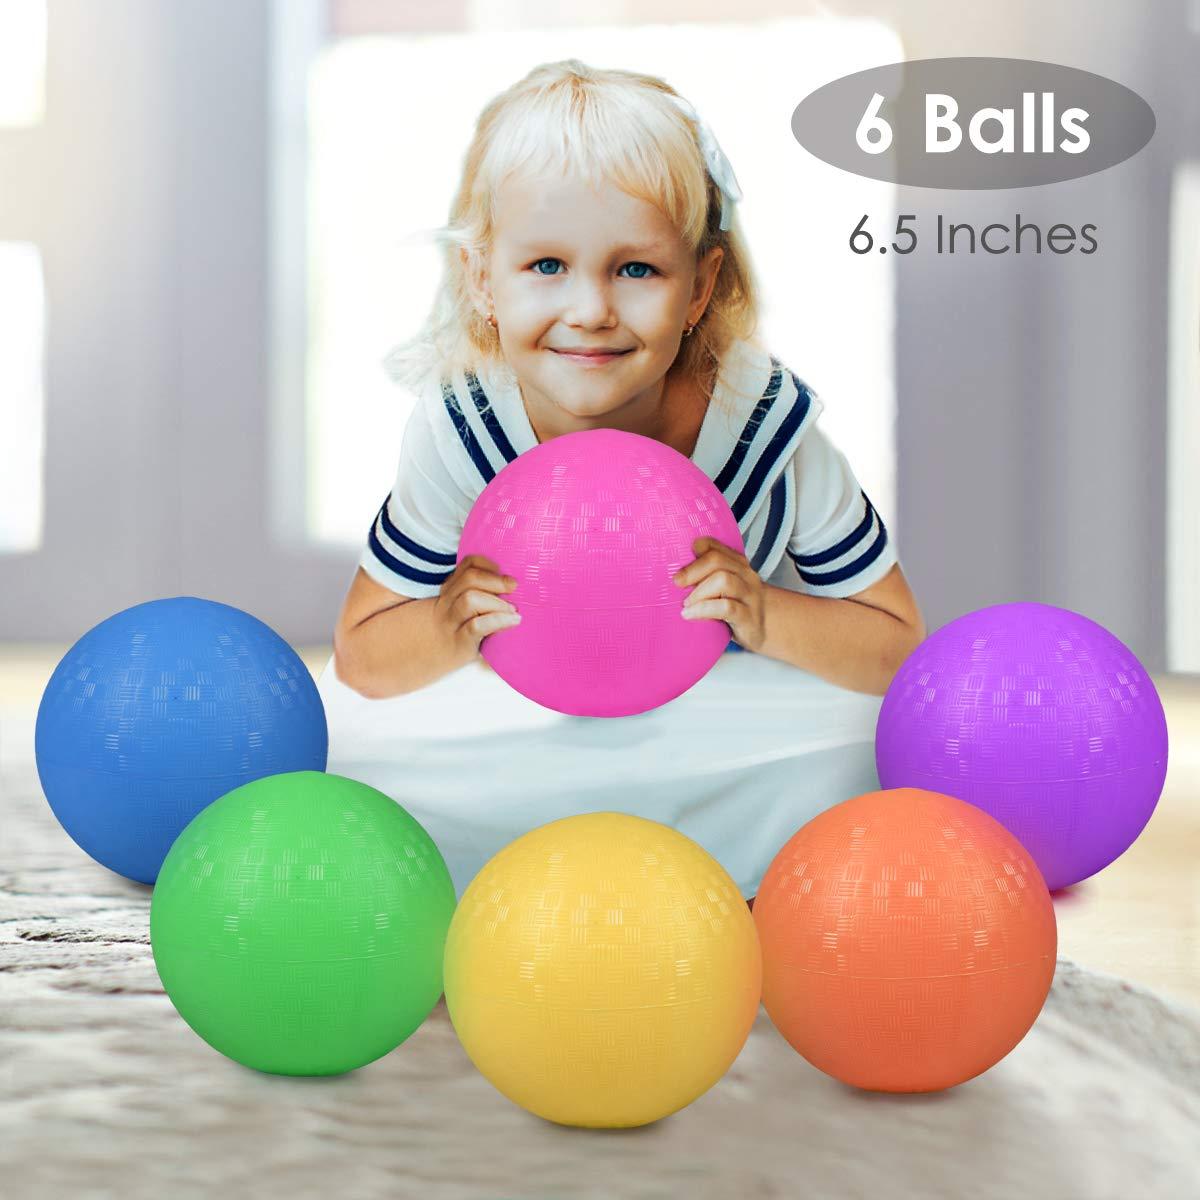 E-BigSales Playground Balls, 6.5inch Inflatable Dodgeball Kickball for Kids, Bouncy Dodge Ball Handball with Free Pump (Set of 6) by E-BigSales